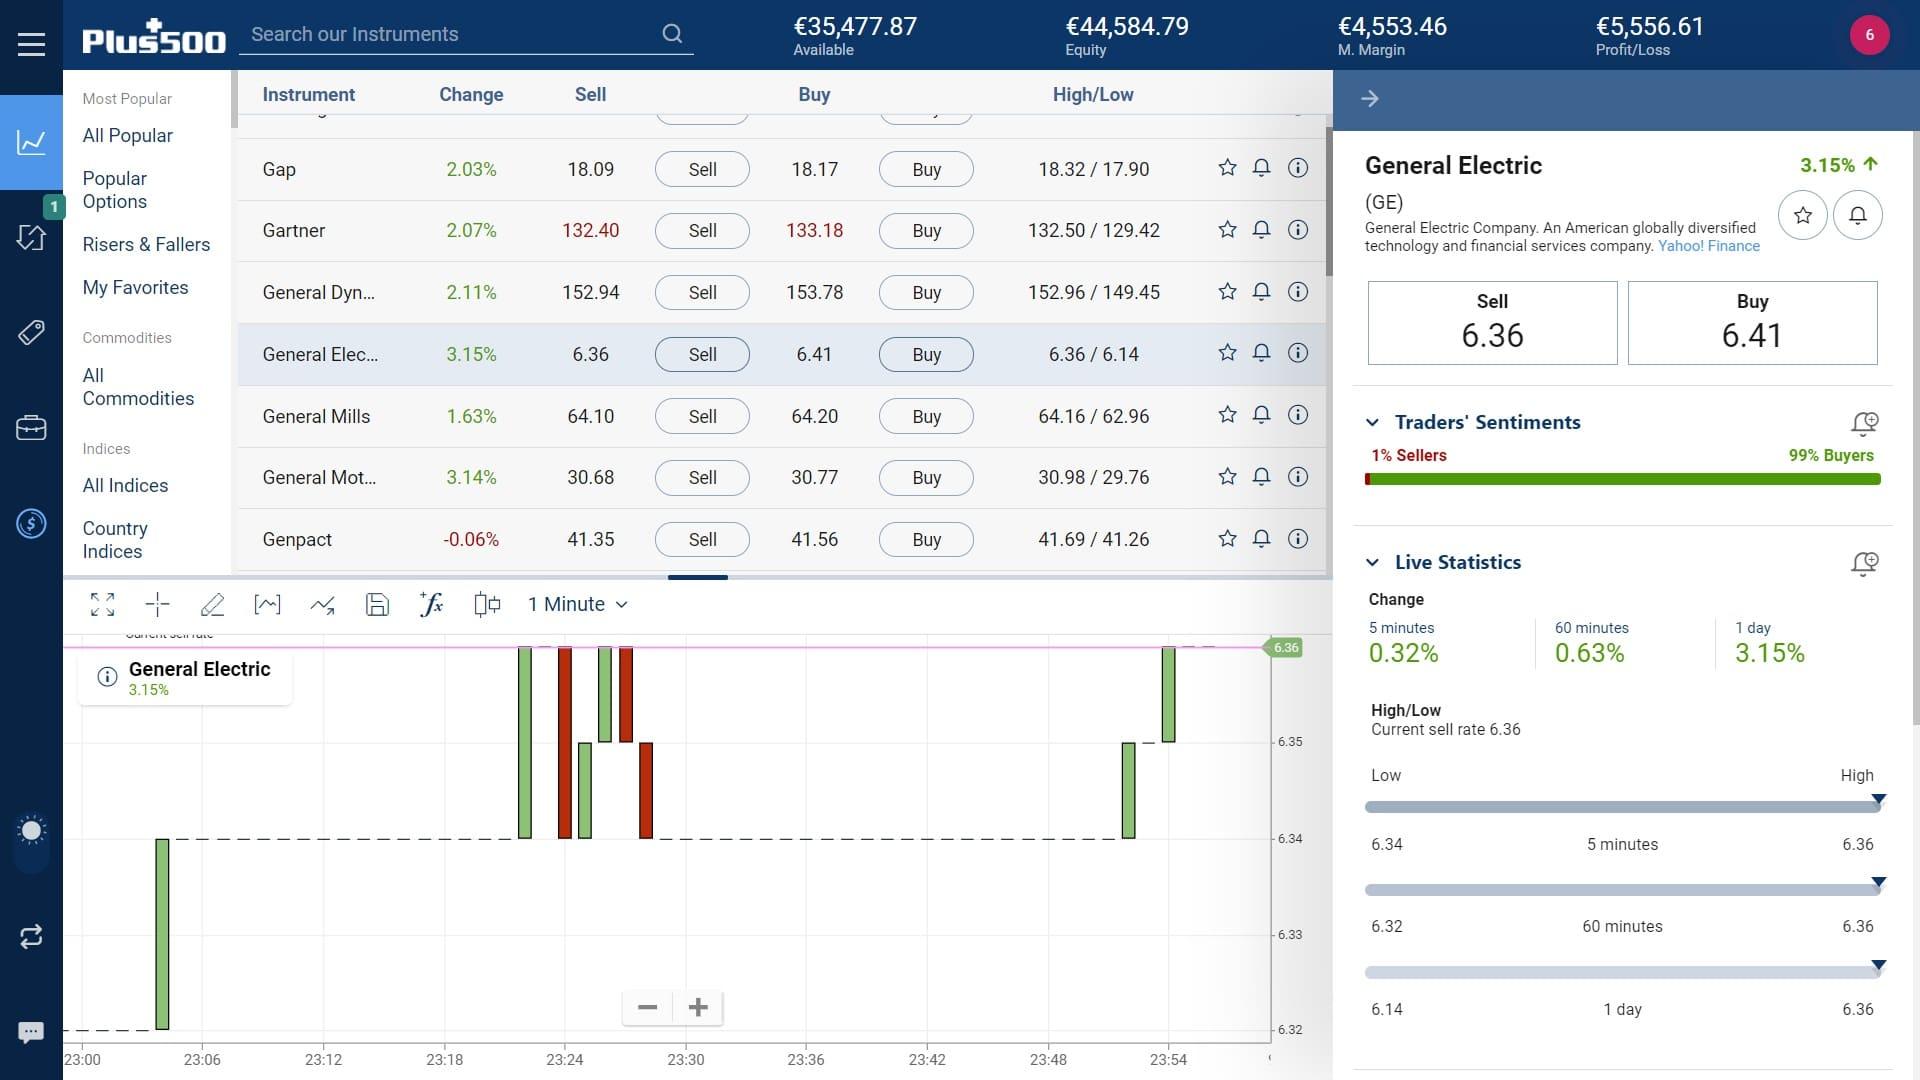 GE stock trading on Plus500's WebTrader platform